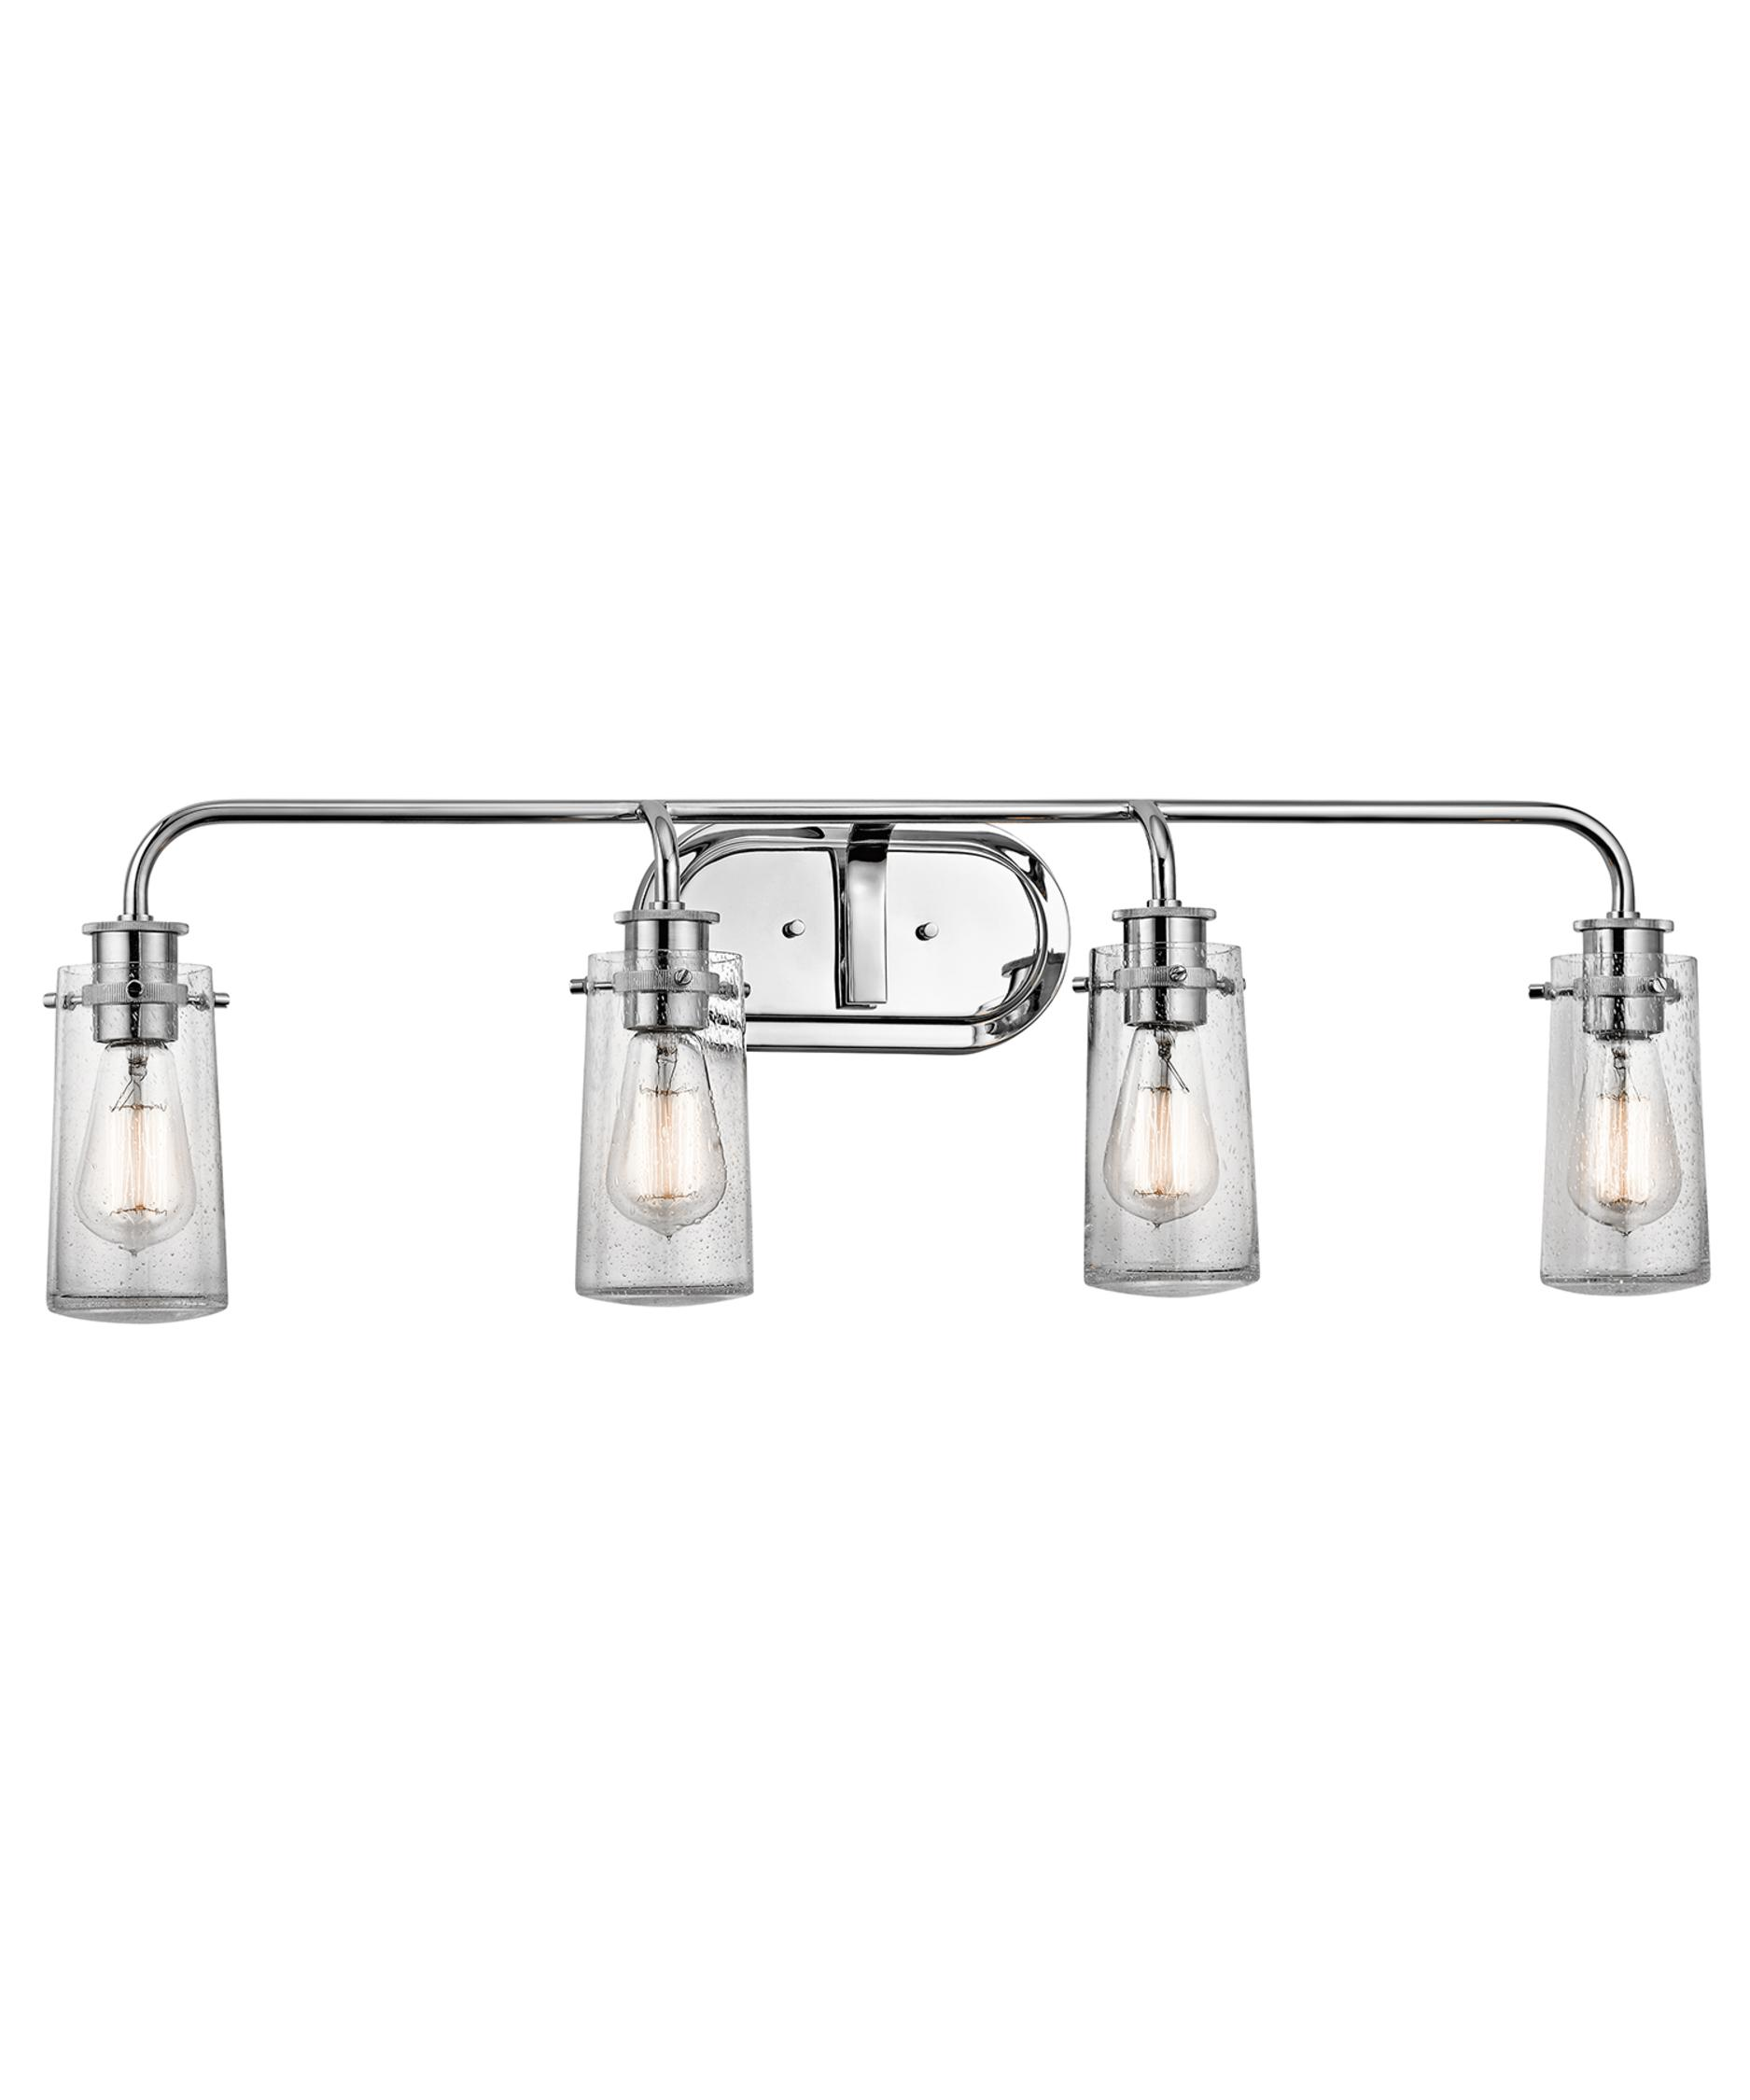 Bathroom Vanity Lights Kichler kichler 45460 braelyn 34 inch wide bath vanity light | capitol